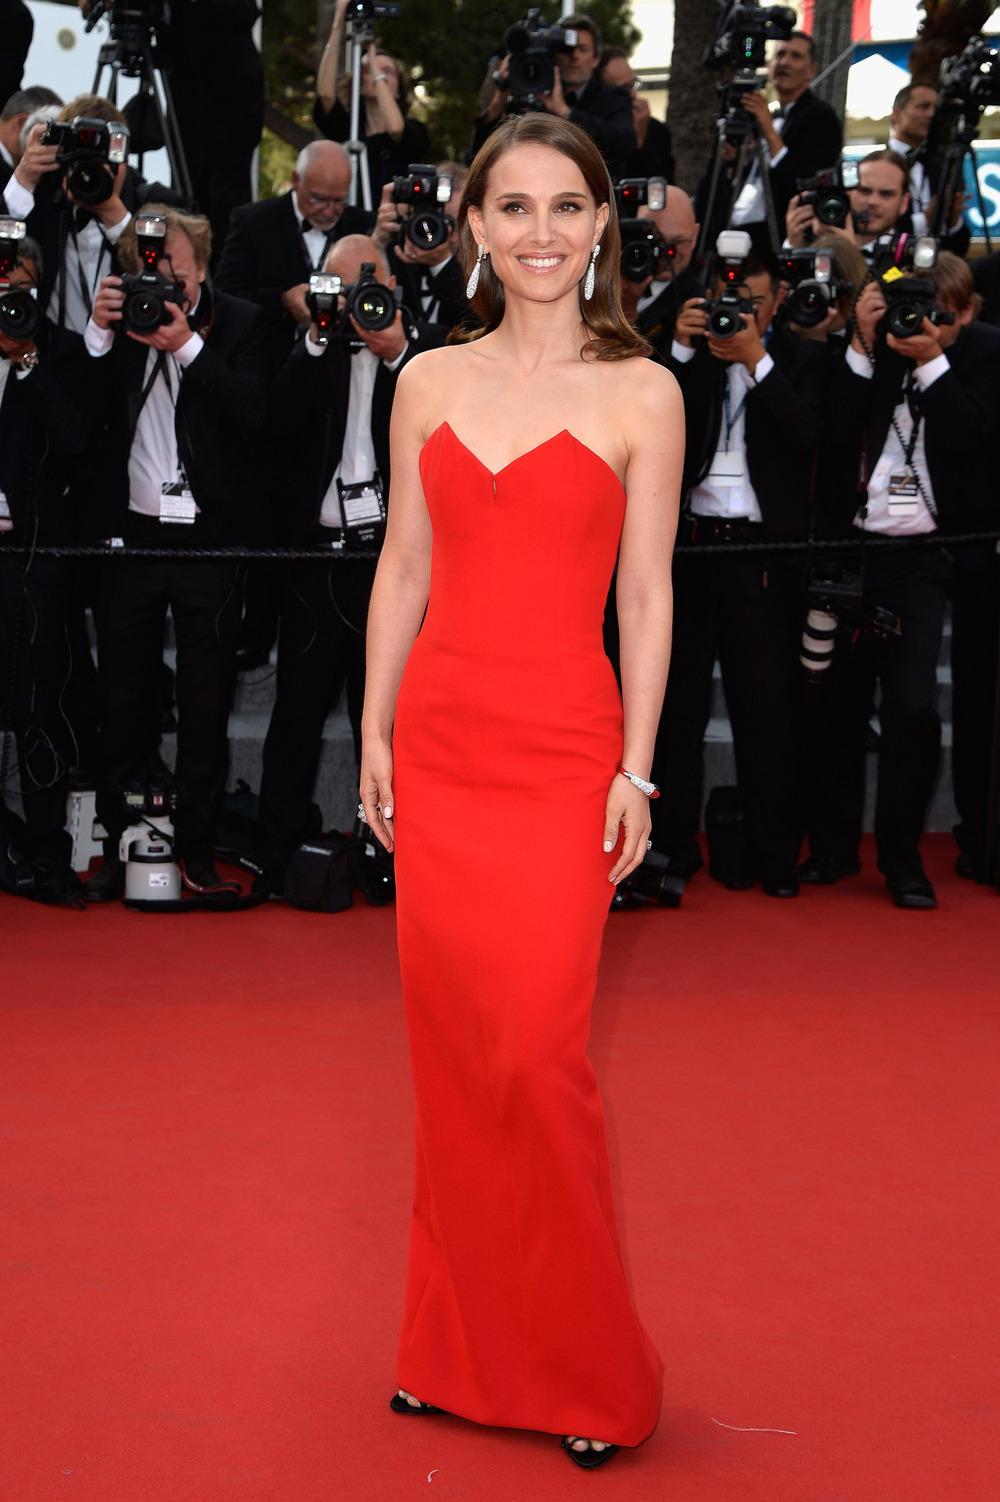 Natalie Portman in Christian Dior